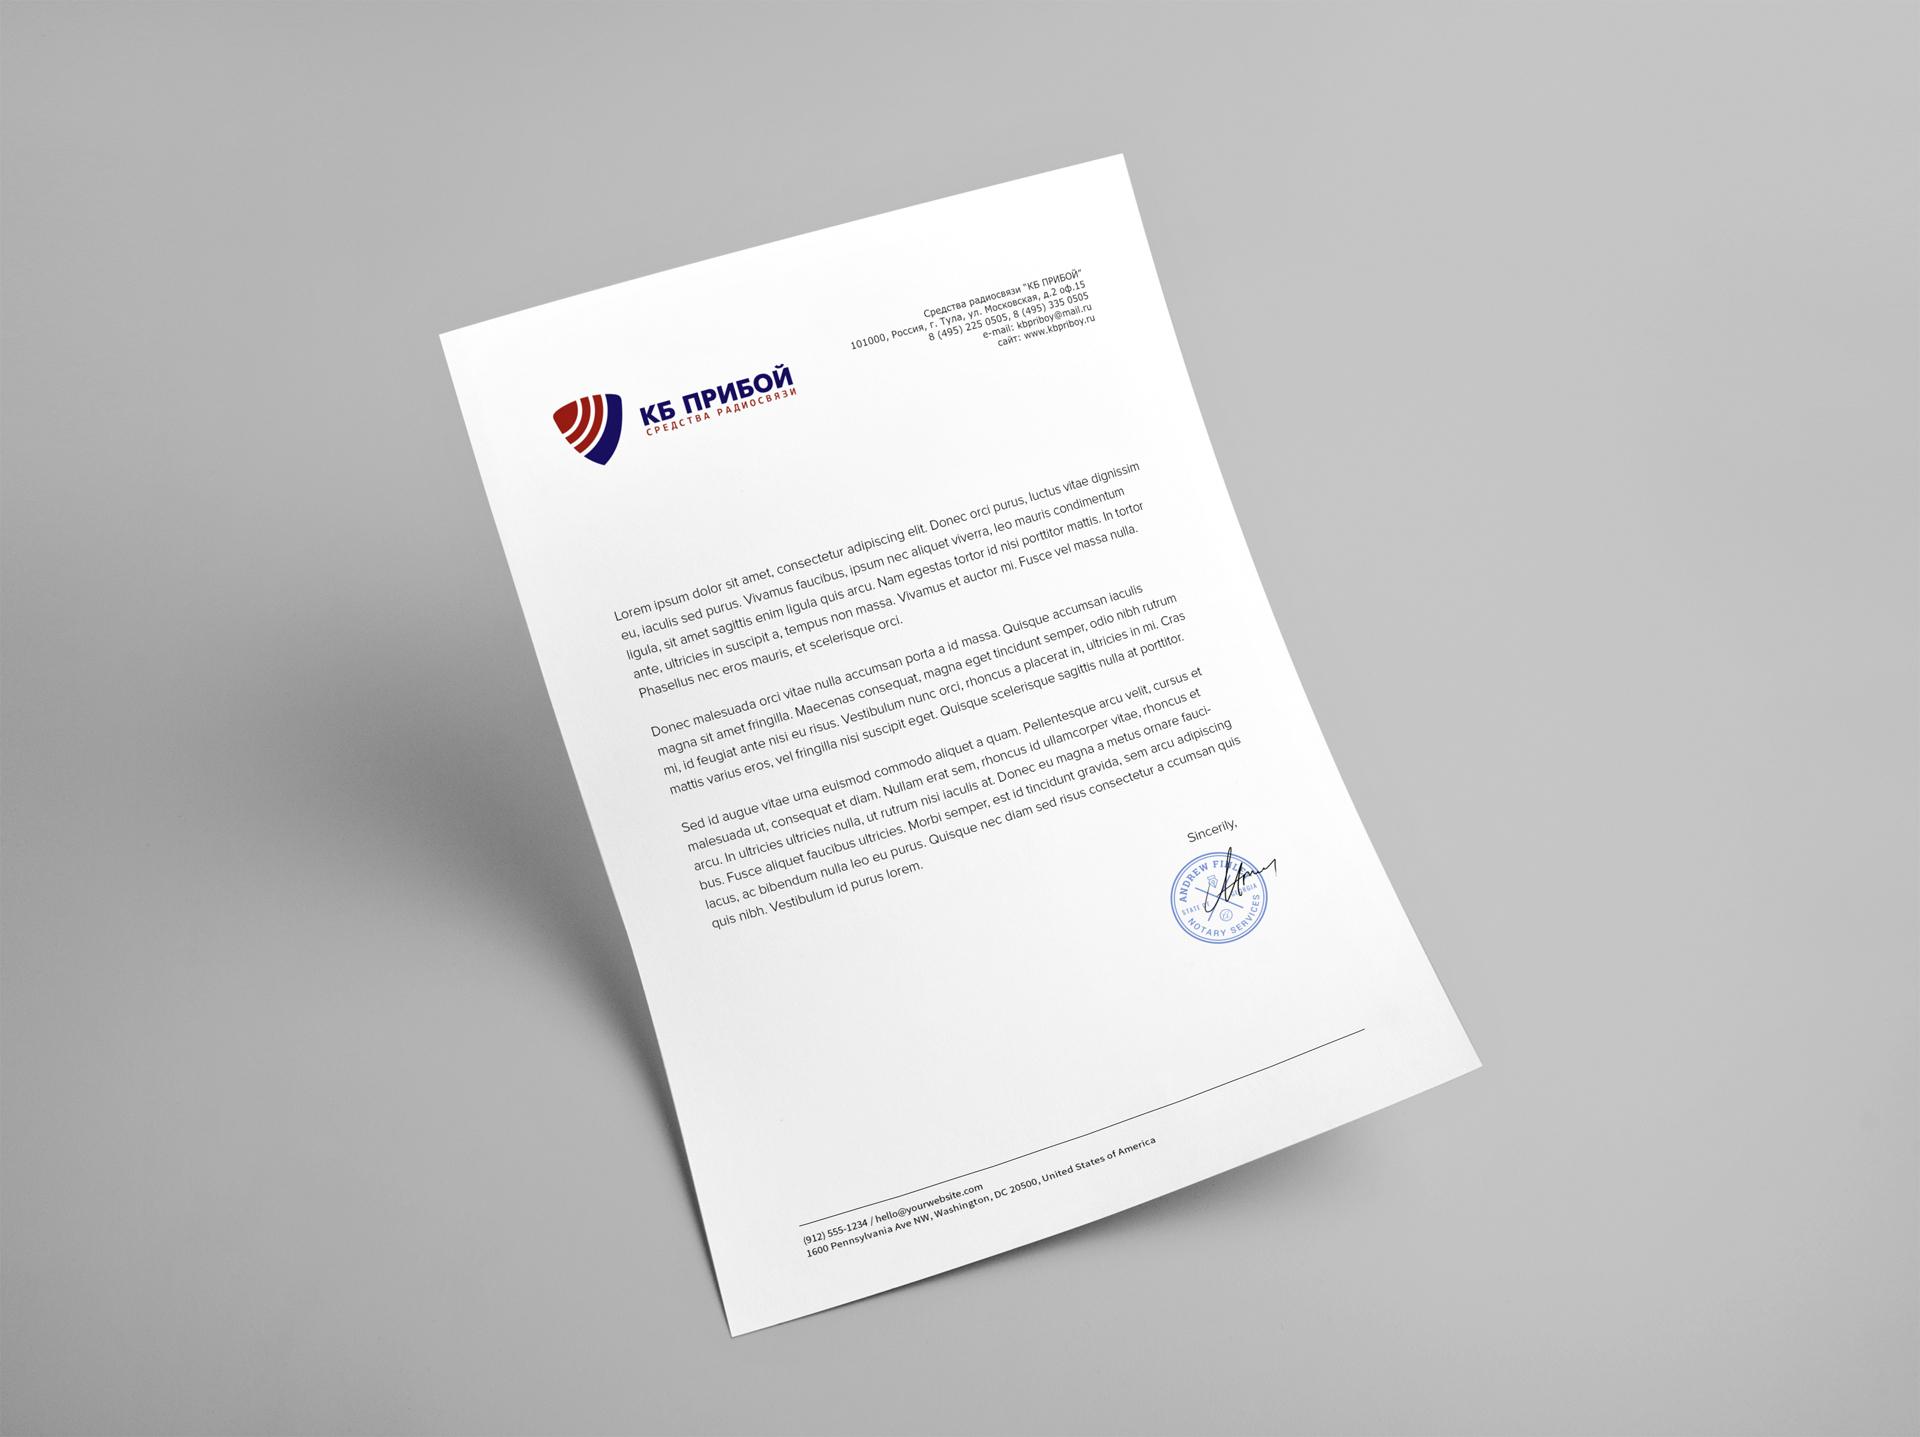 Разработка логотипа и фирменного стиля для КБ Прибой фото f_7405b2926e7146ef.jpg